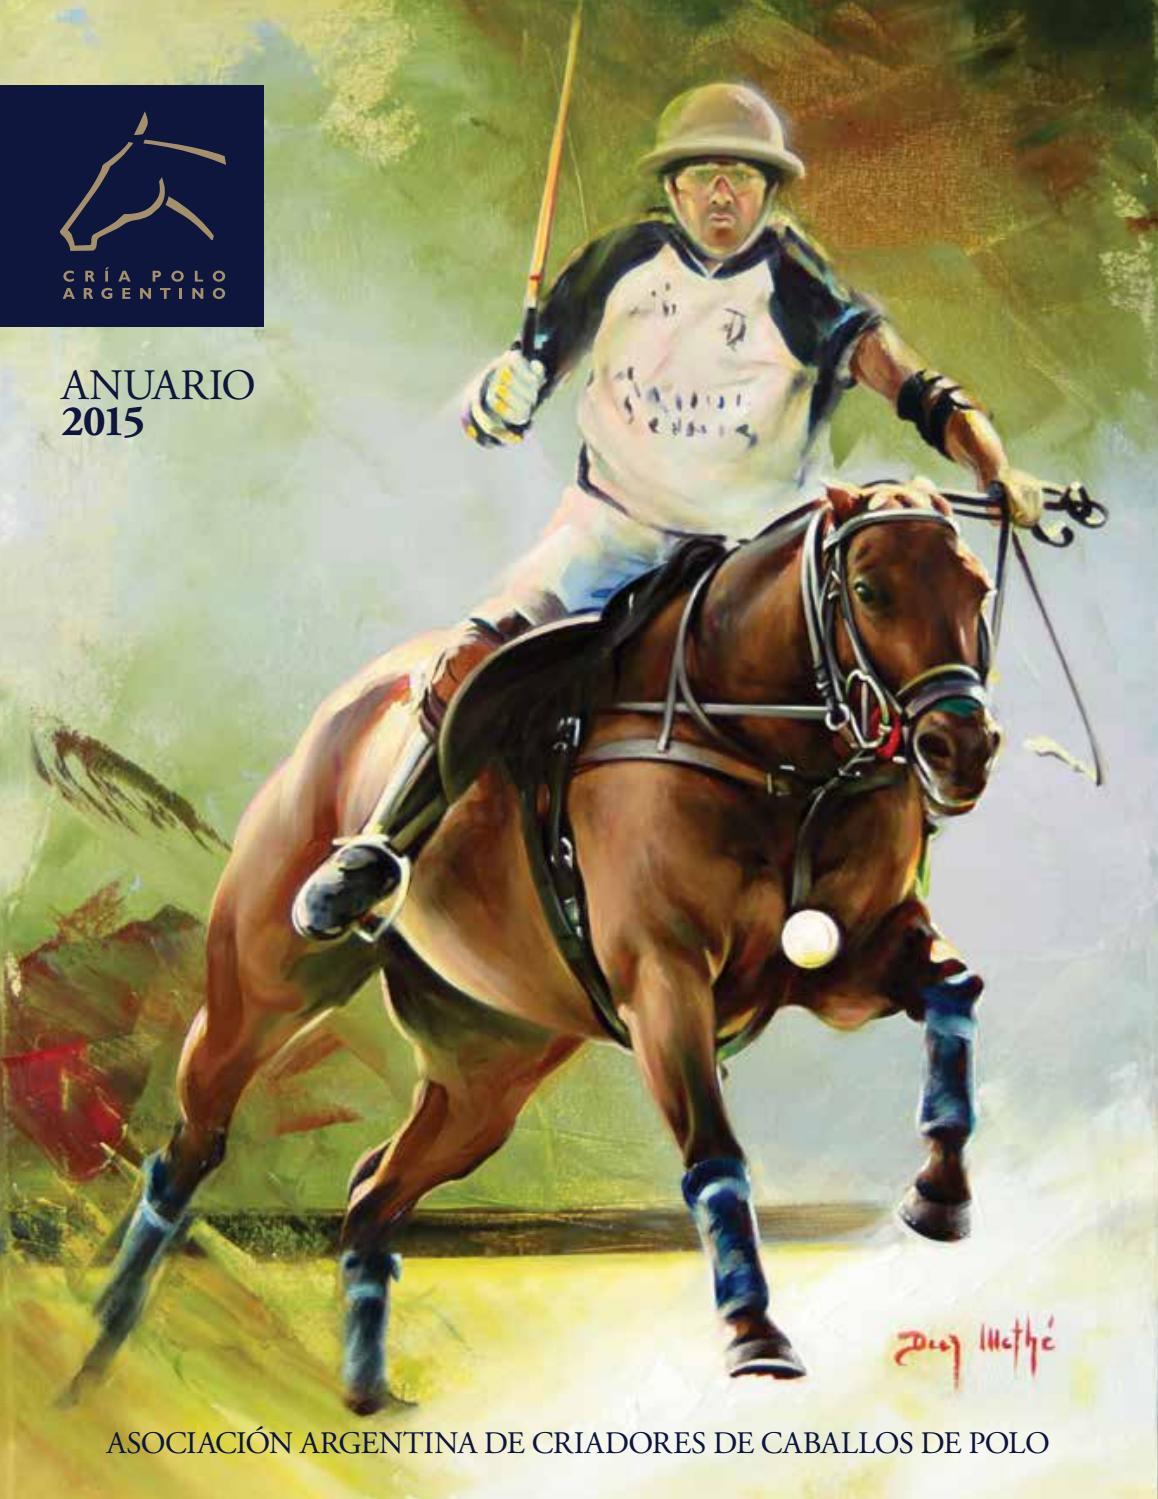 19e4e232d6a Anuario AACCP 2015 by .tom graphics - issuu